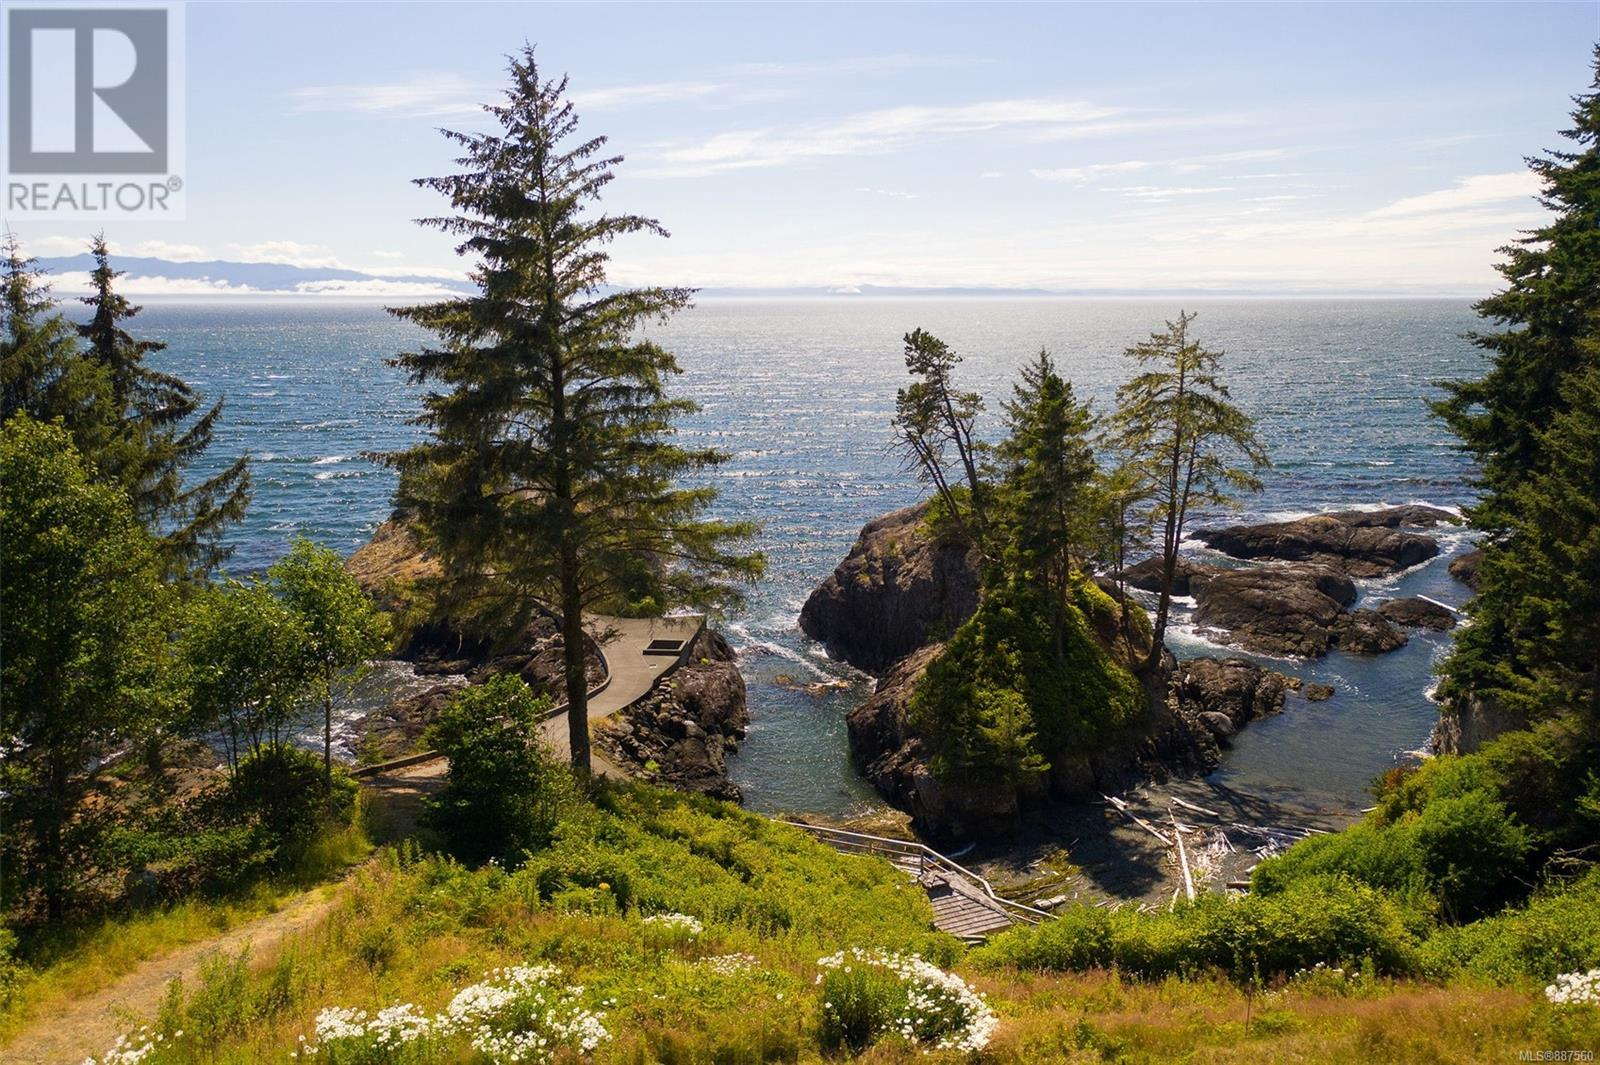 1188 Silver Spray DrSooke, British Columbia  V0S 1N0 - Photo 2 - 887560